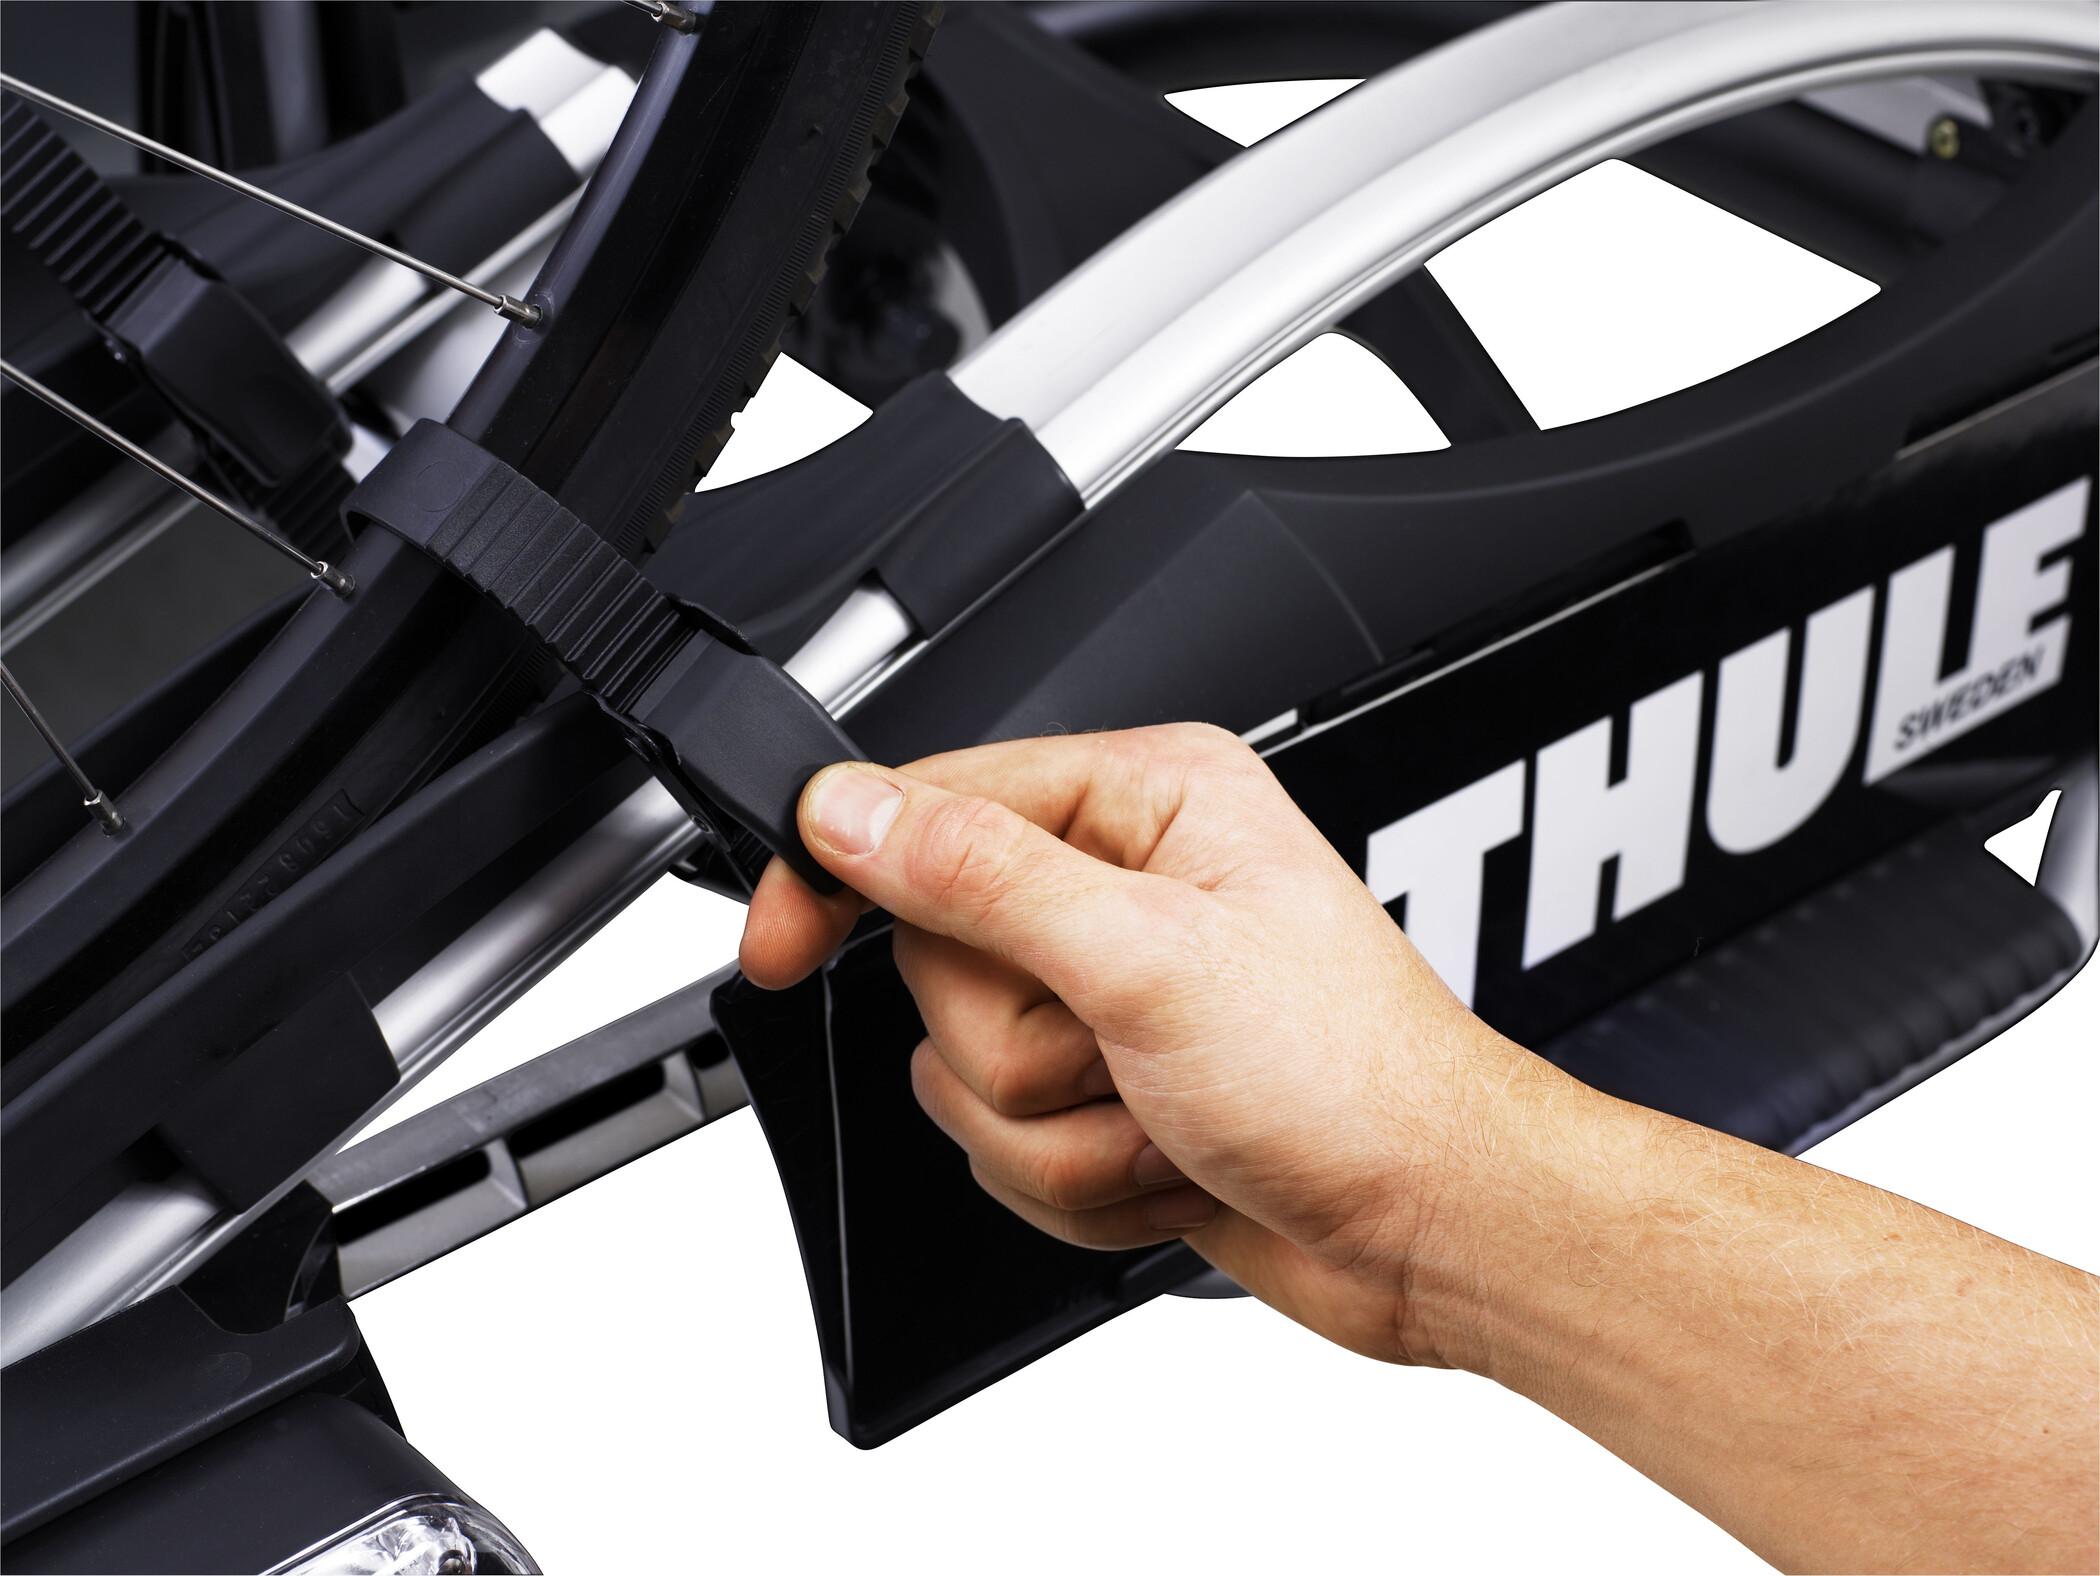 Thule 935 Fahrradträger 2 Bike online kaufen | bikester.at